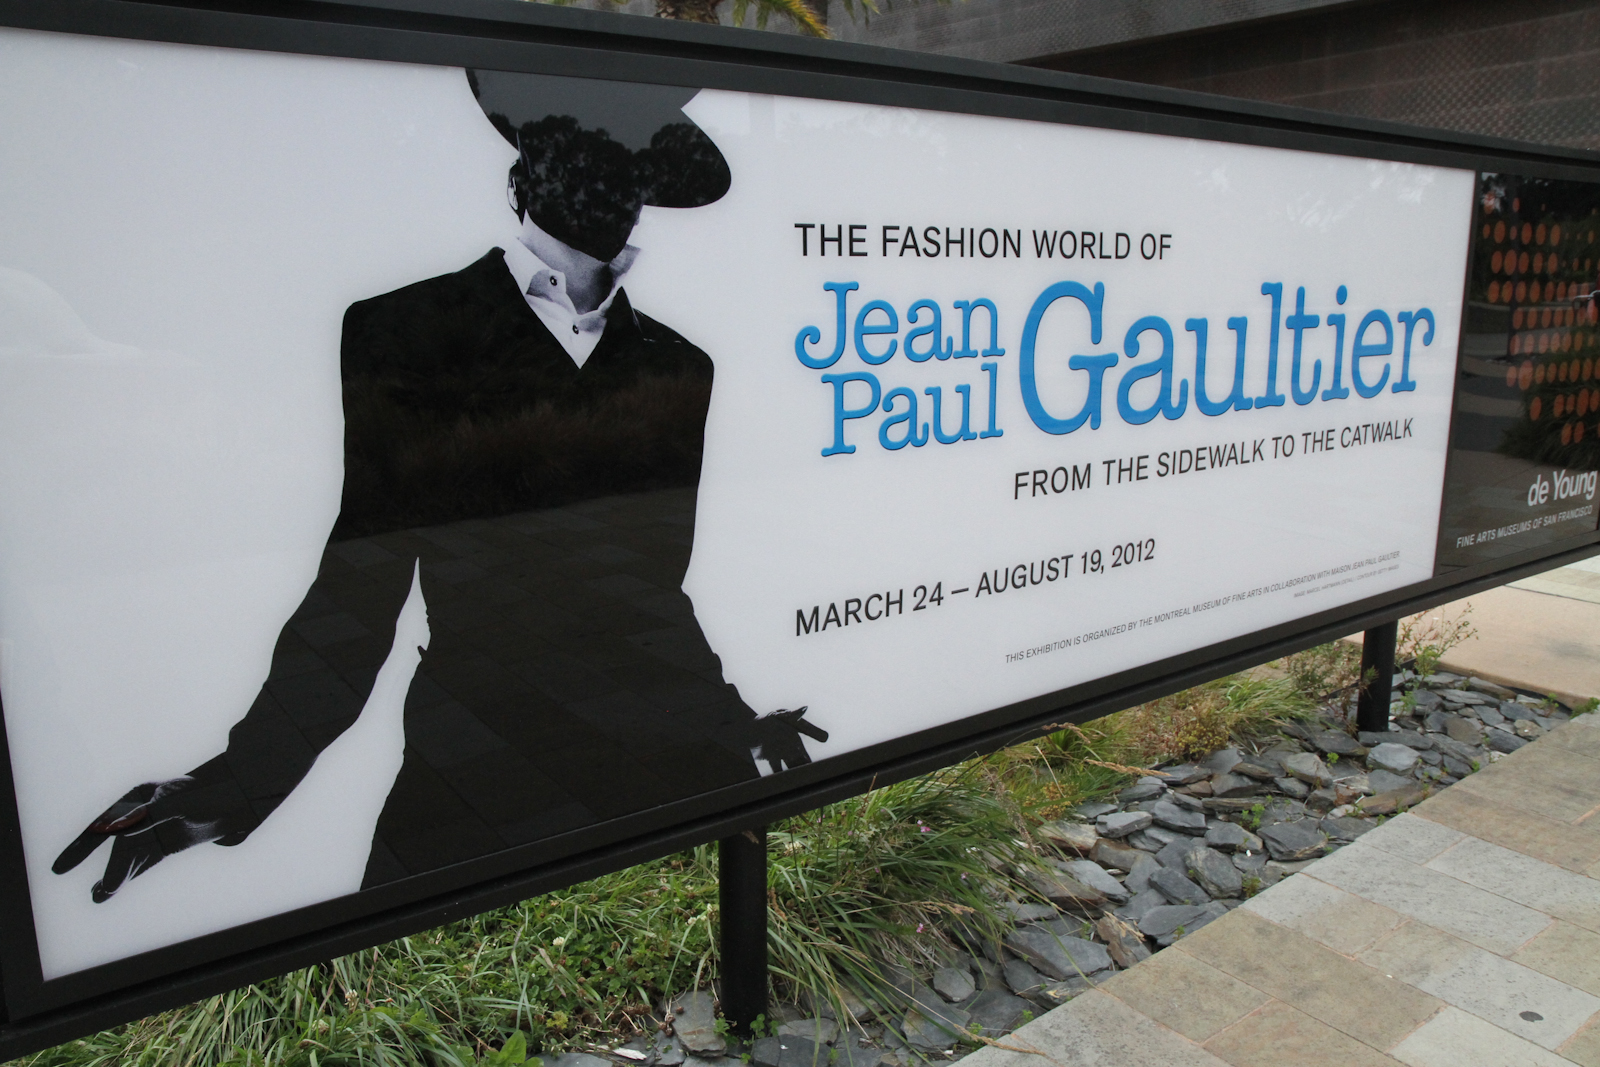 Gaultier on Display